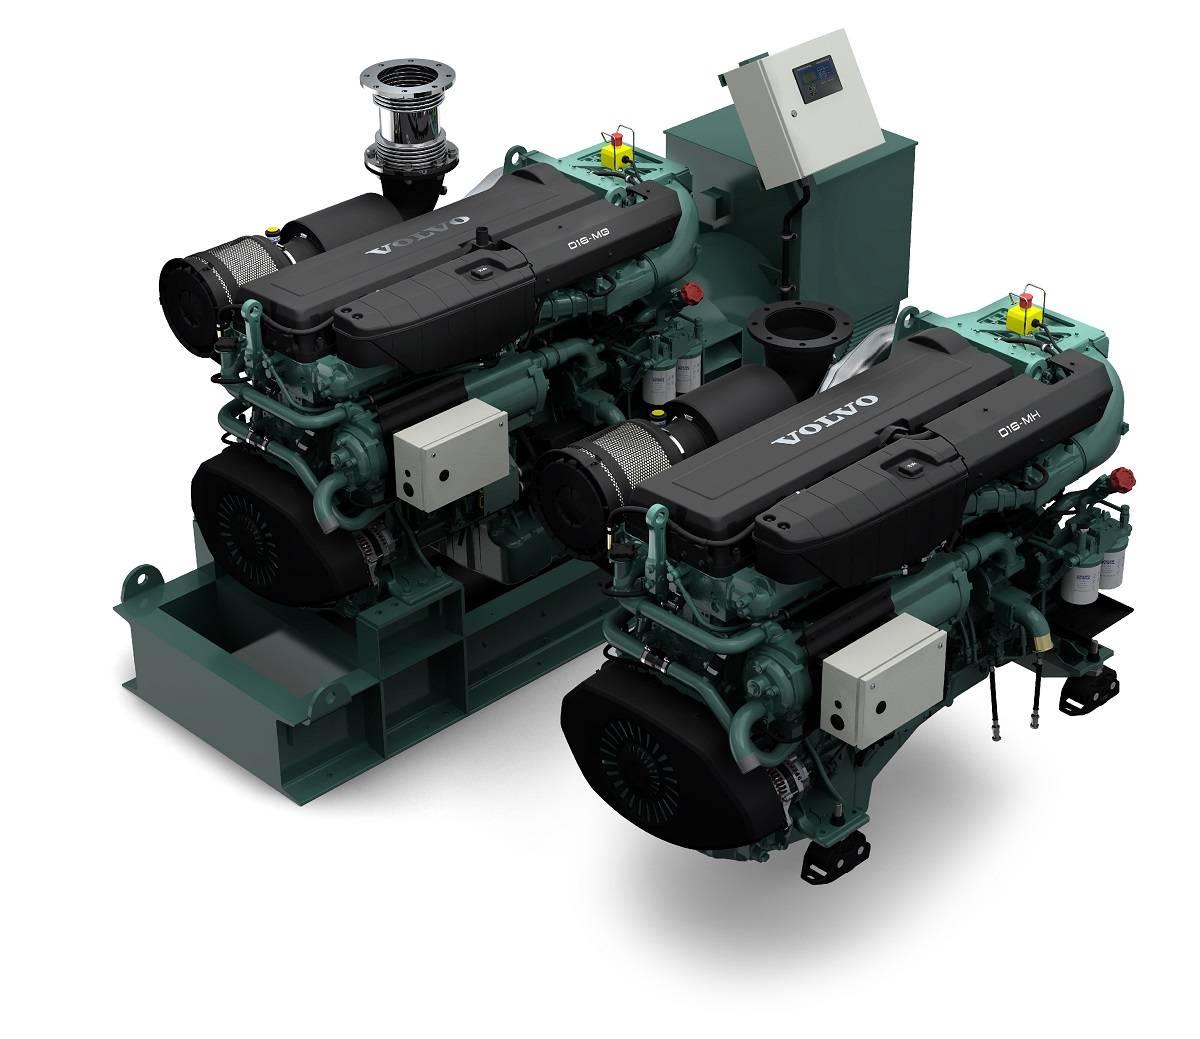 Volvo Marine Engines: Volvo Penta Debuts Updated D16 Engine